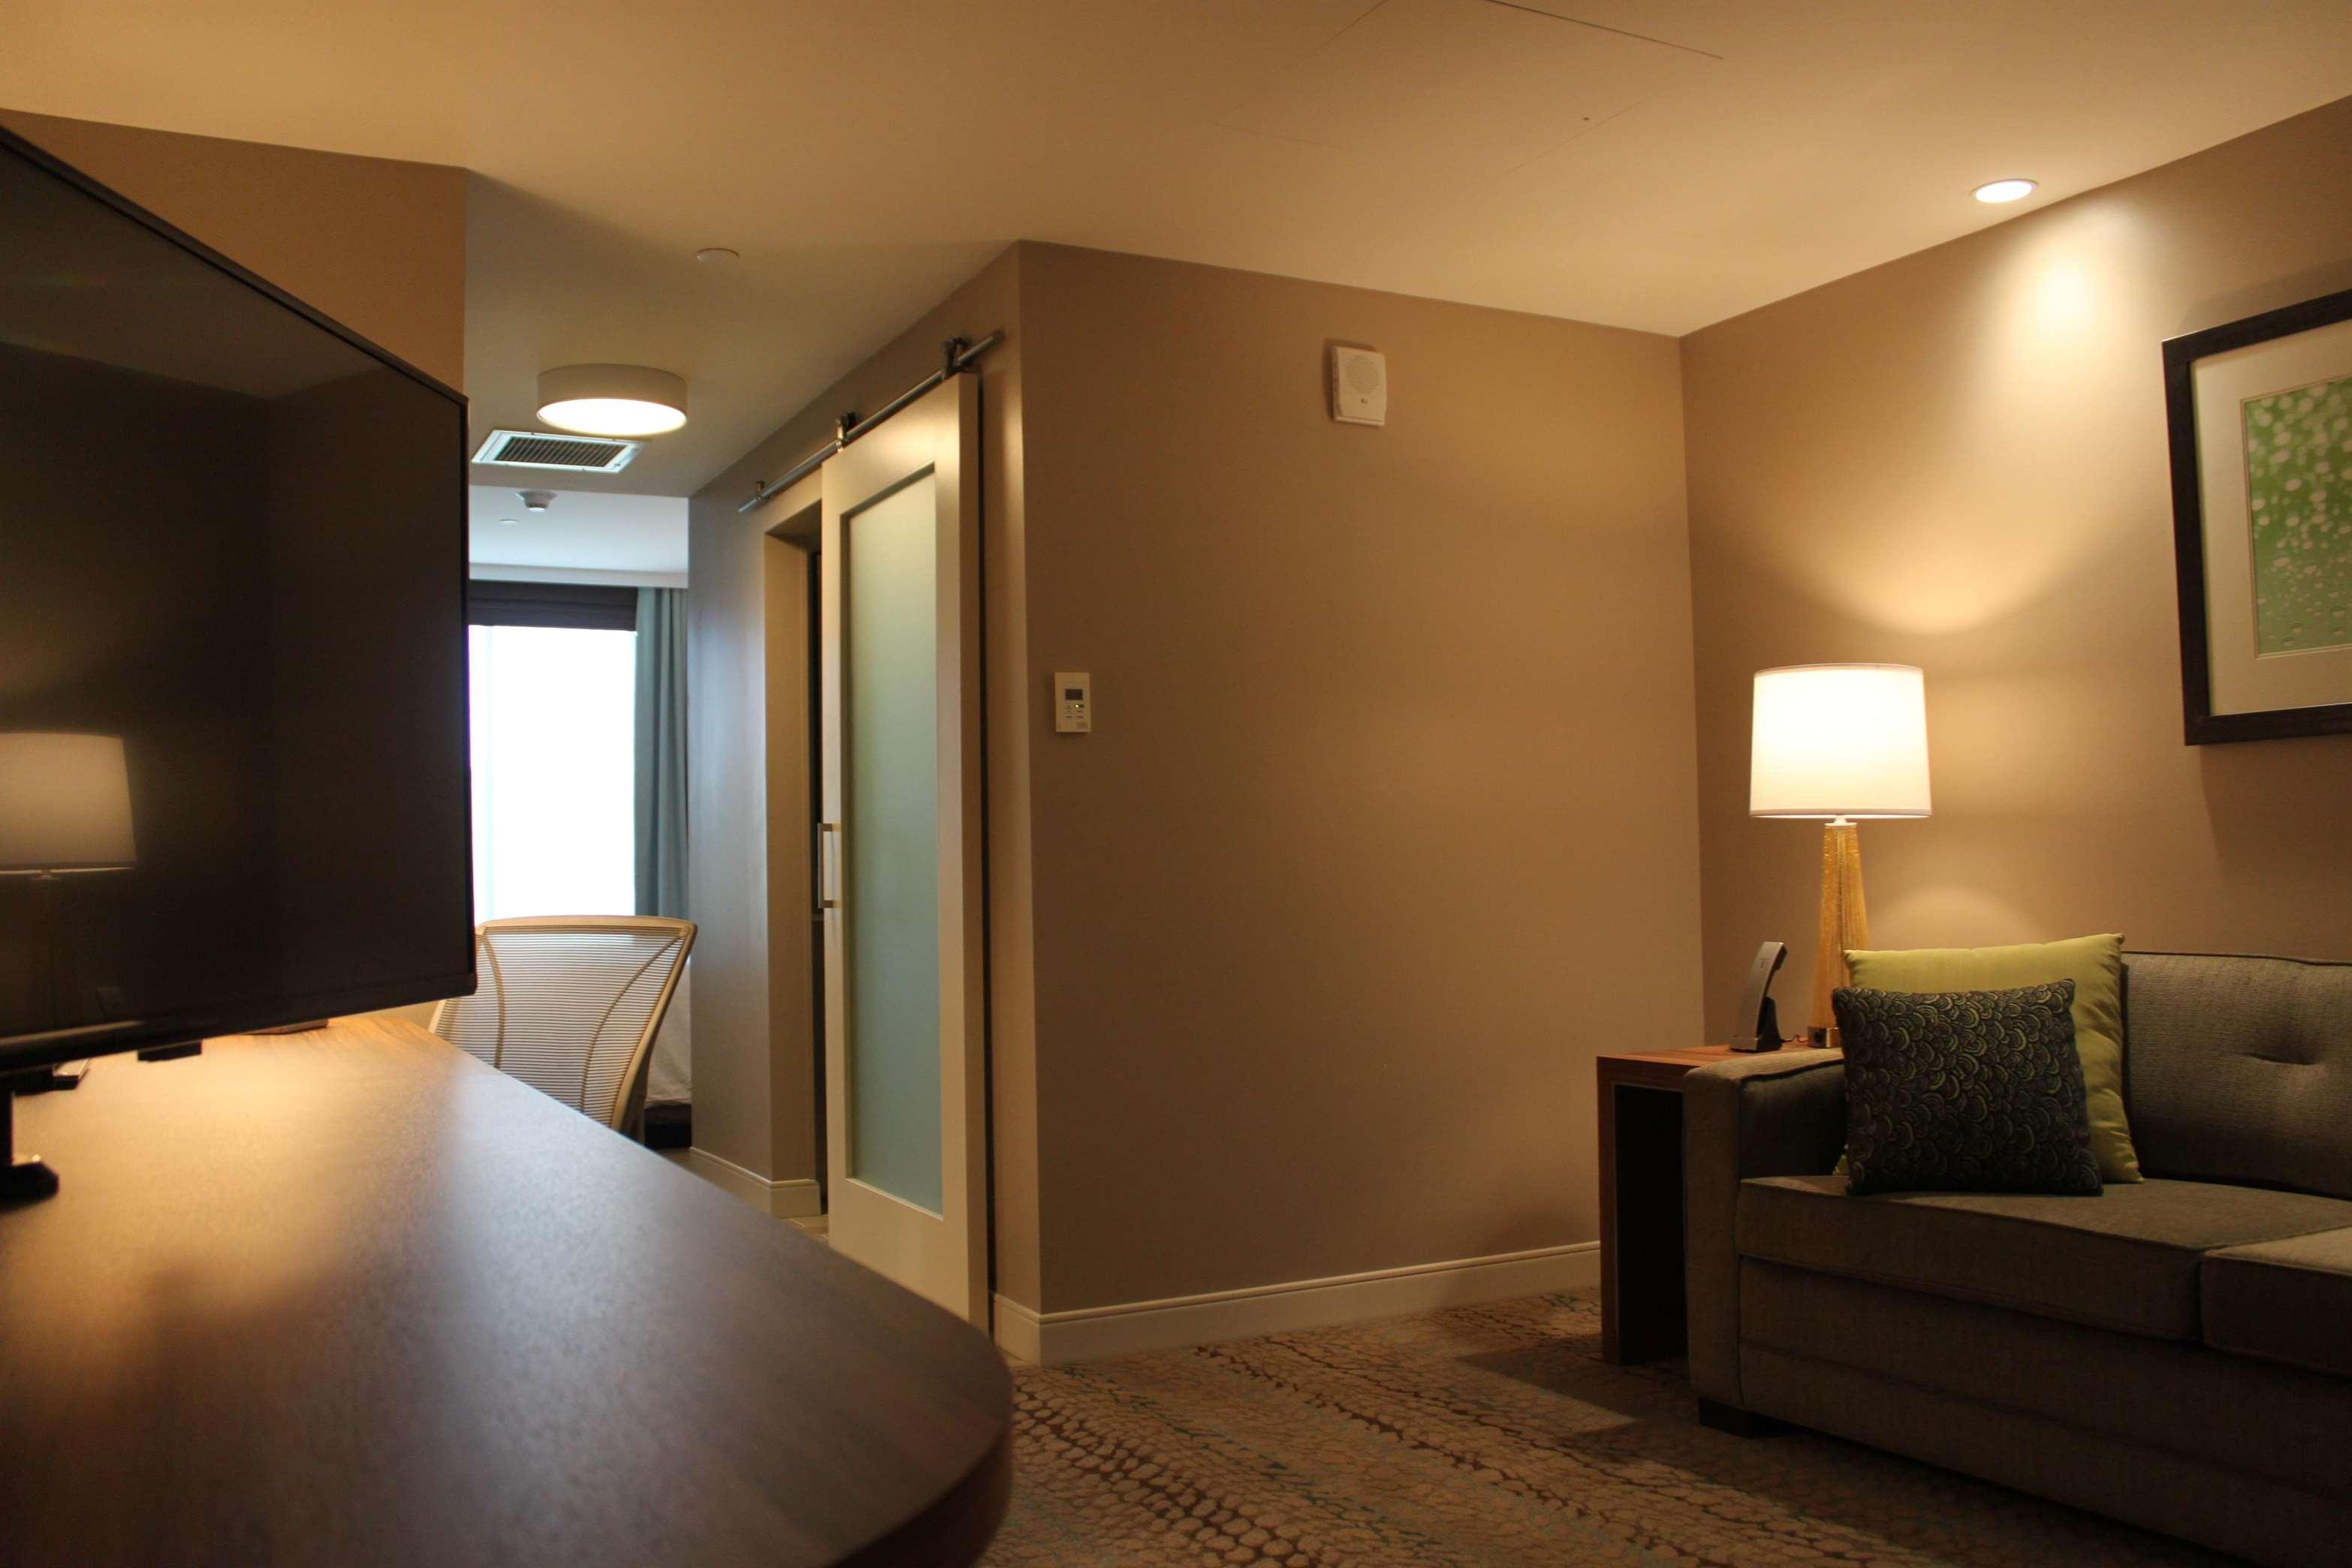 Hilton Garden Inn Boston/Marlborough image 17